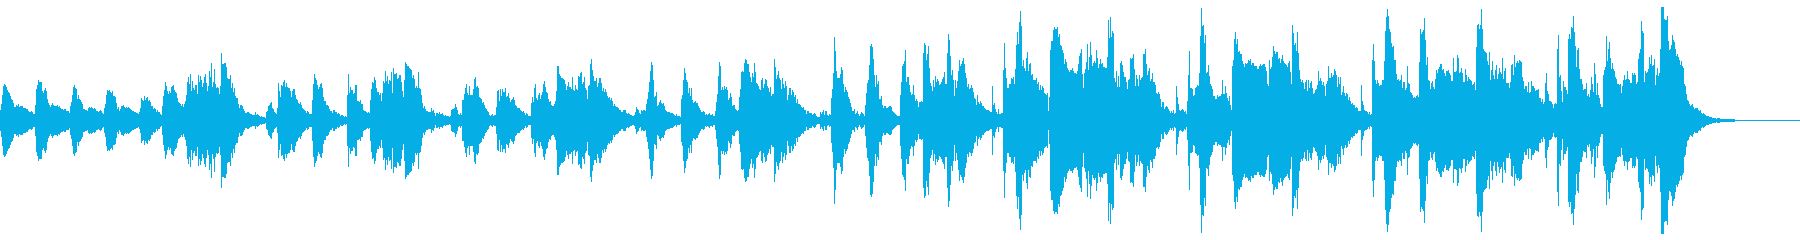 T.V.コンテンポラリーインスト卑...の再生済みの波形